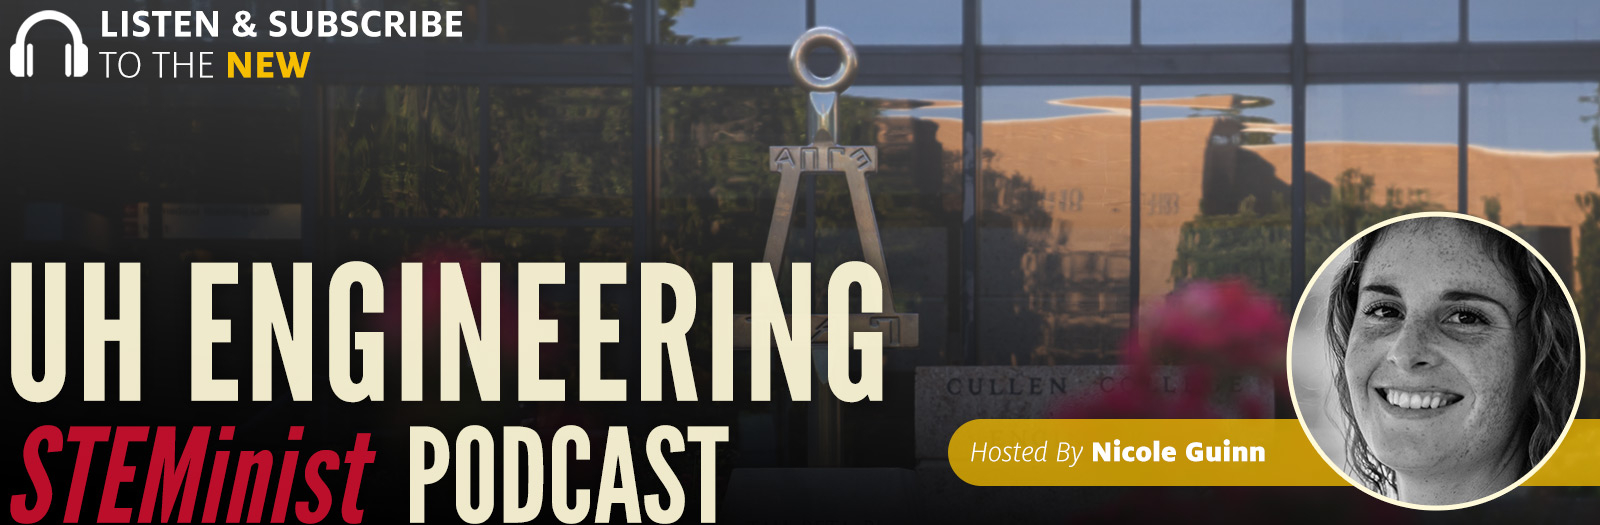 UH Engineering Podcast